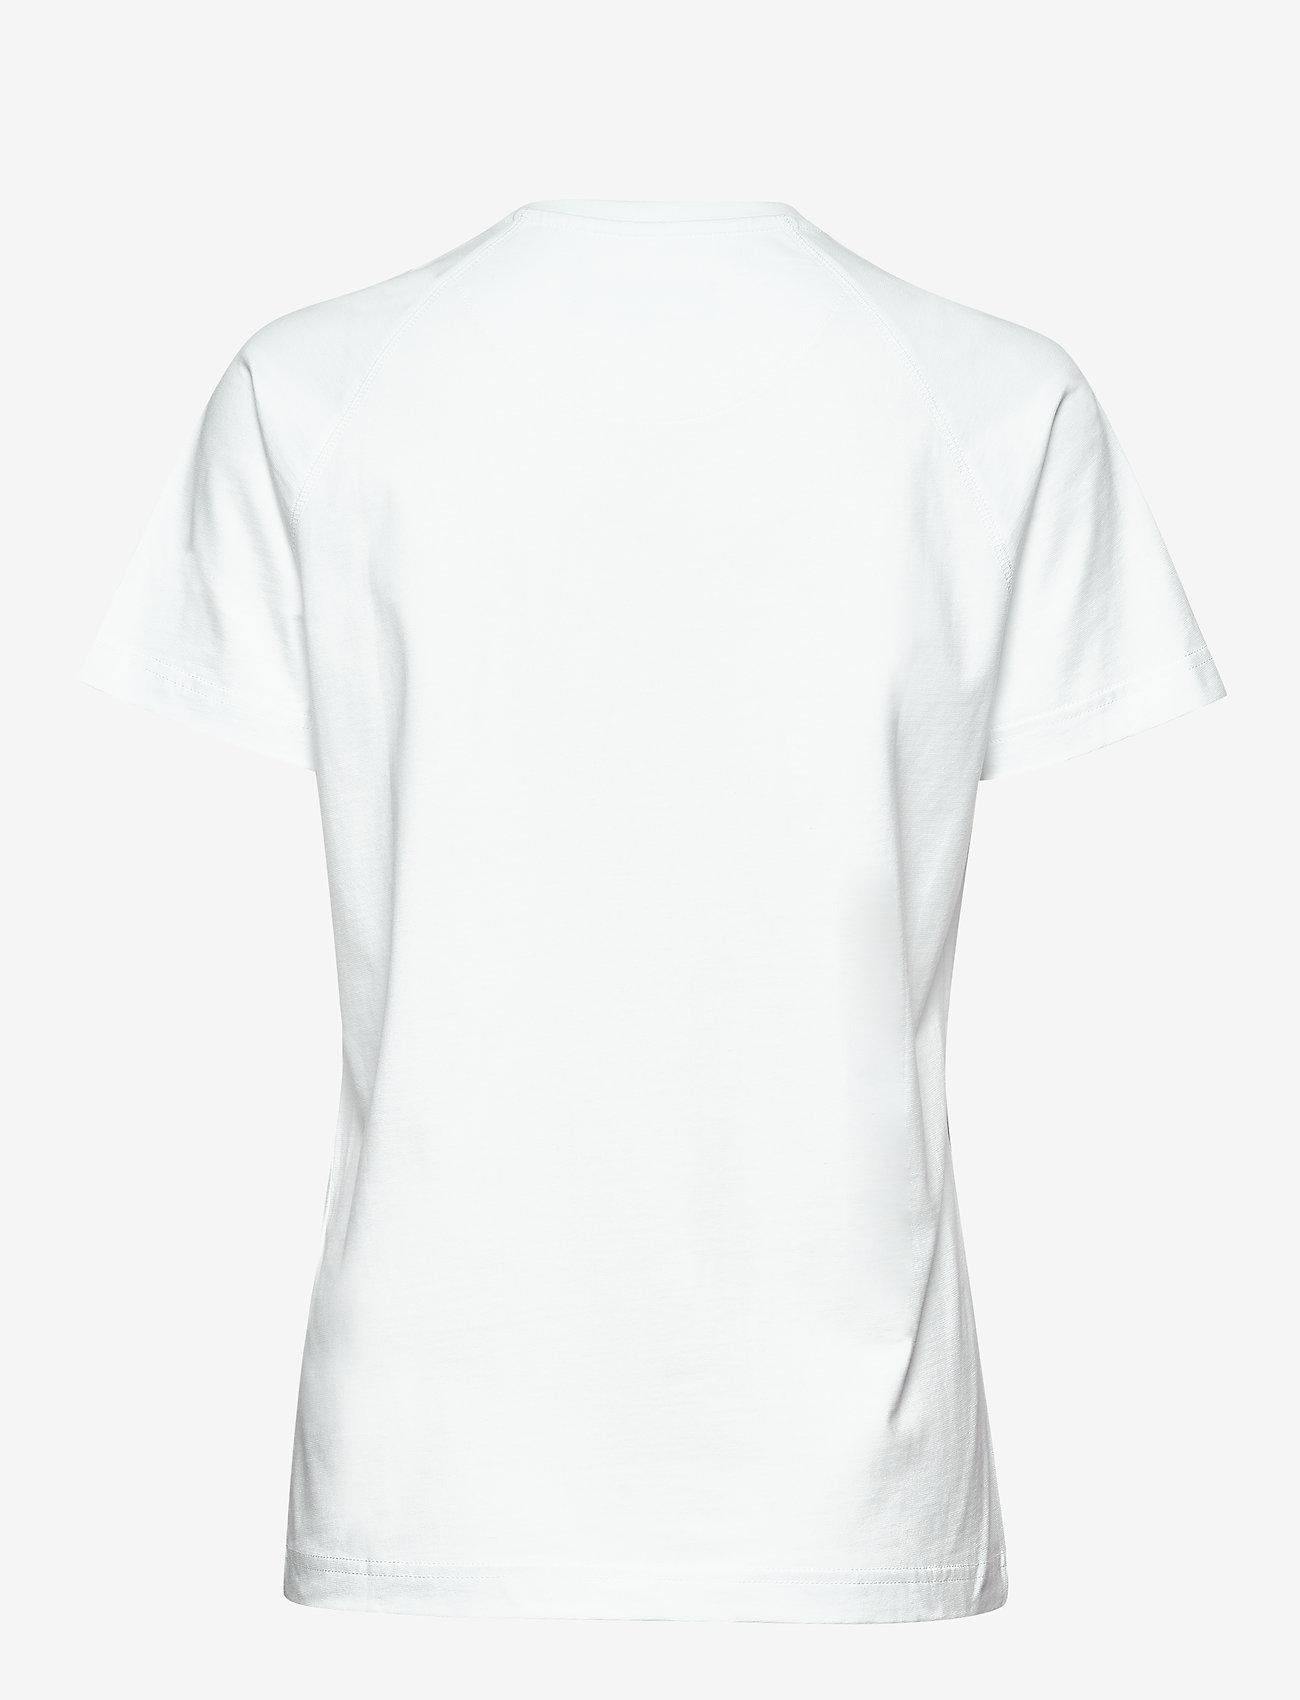 Henley T-shirt (White) - Makia 1AqWWv